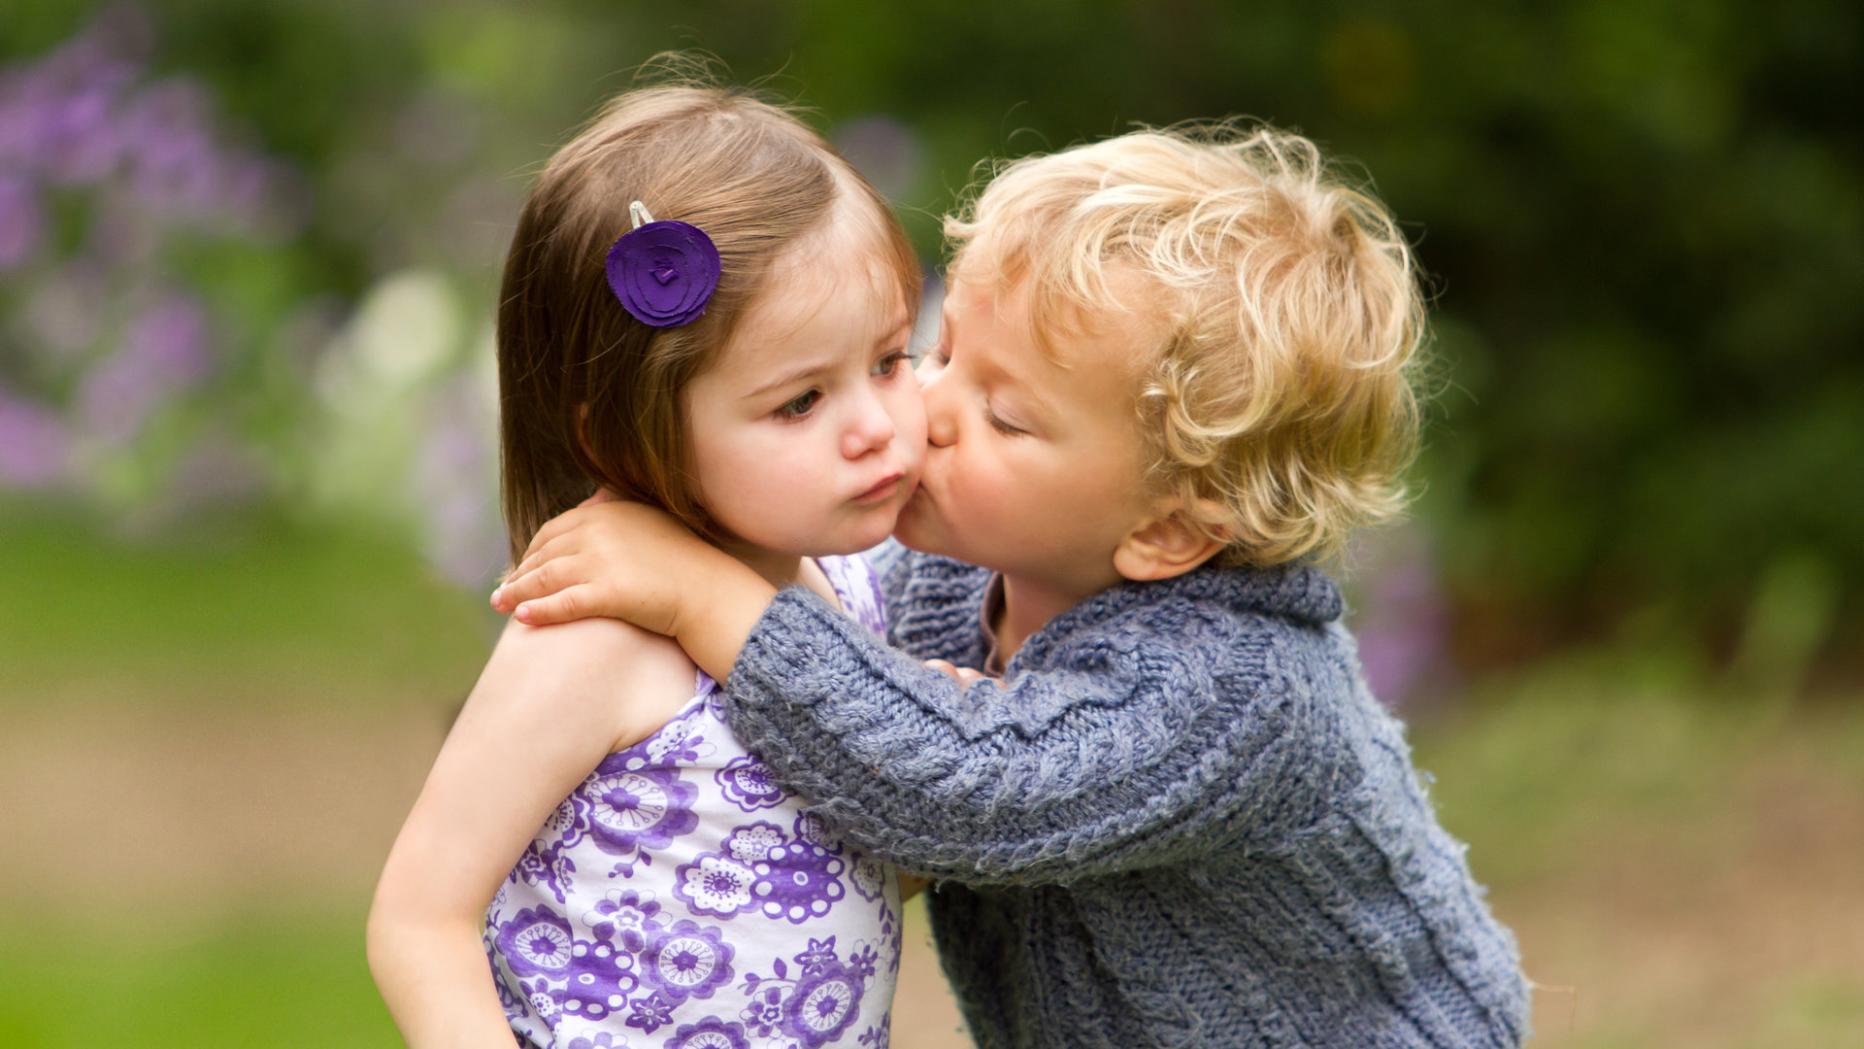 Wange an körpersprache wange umarmung Wange kuss